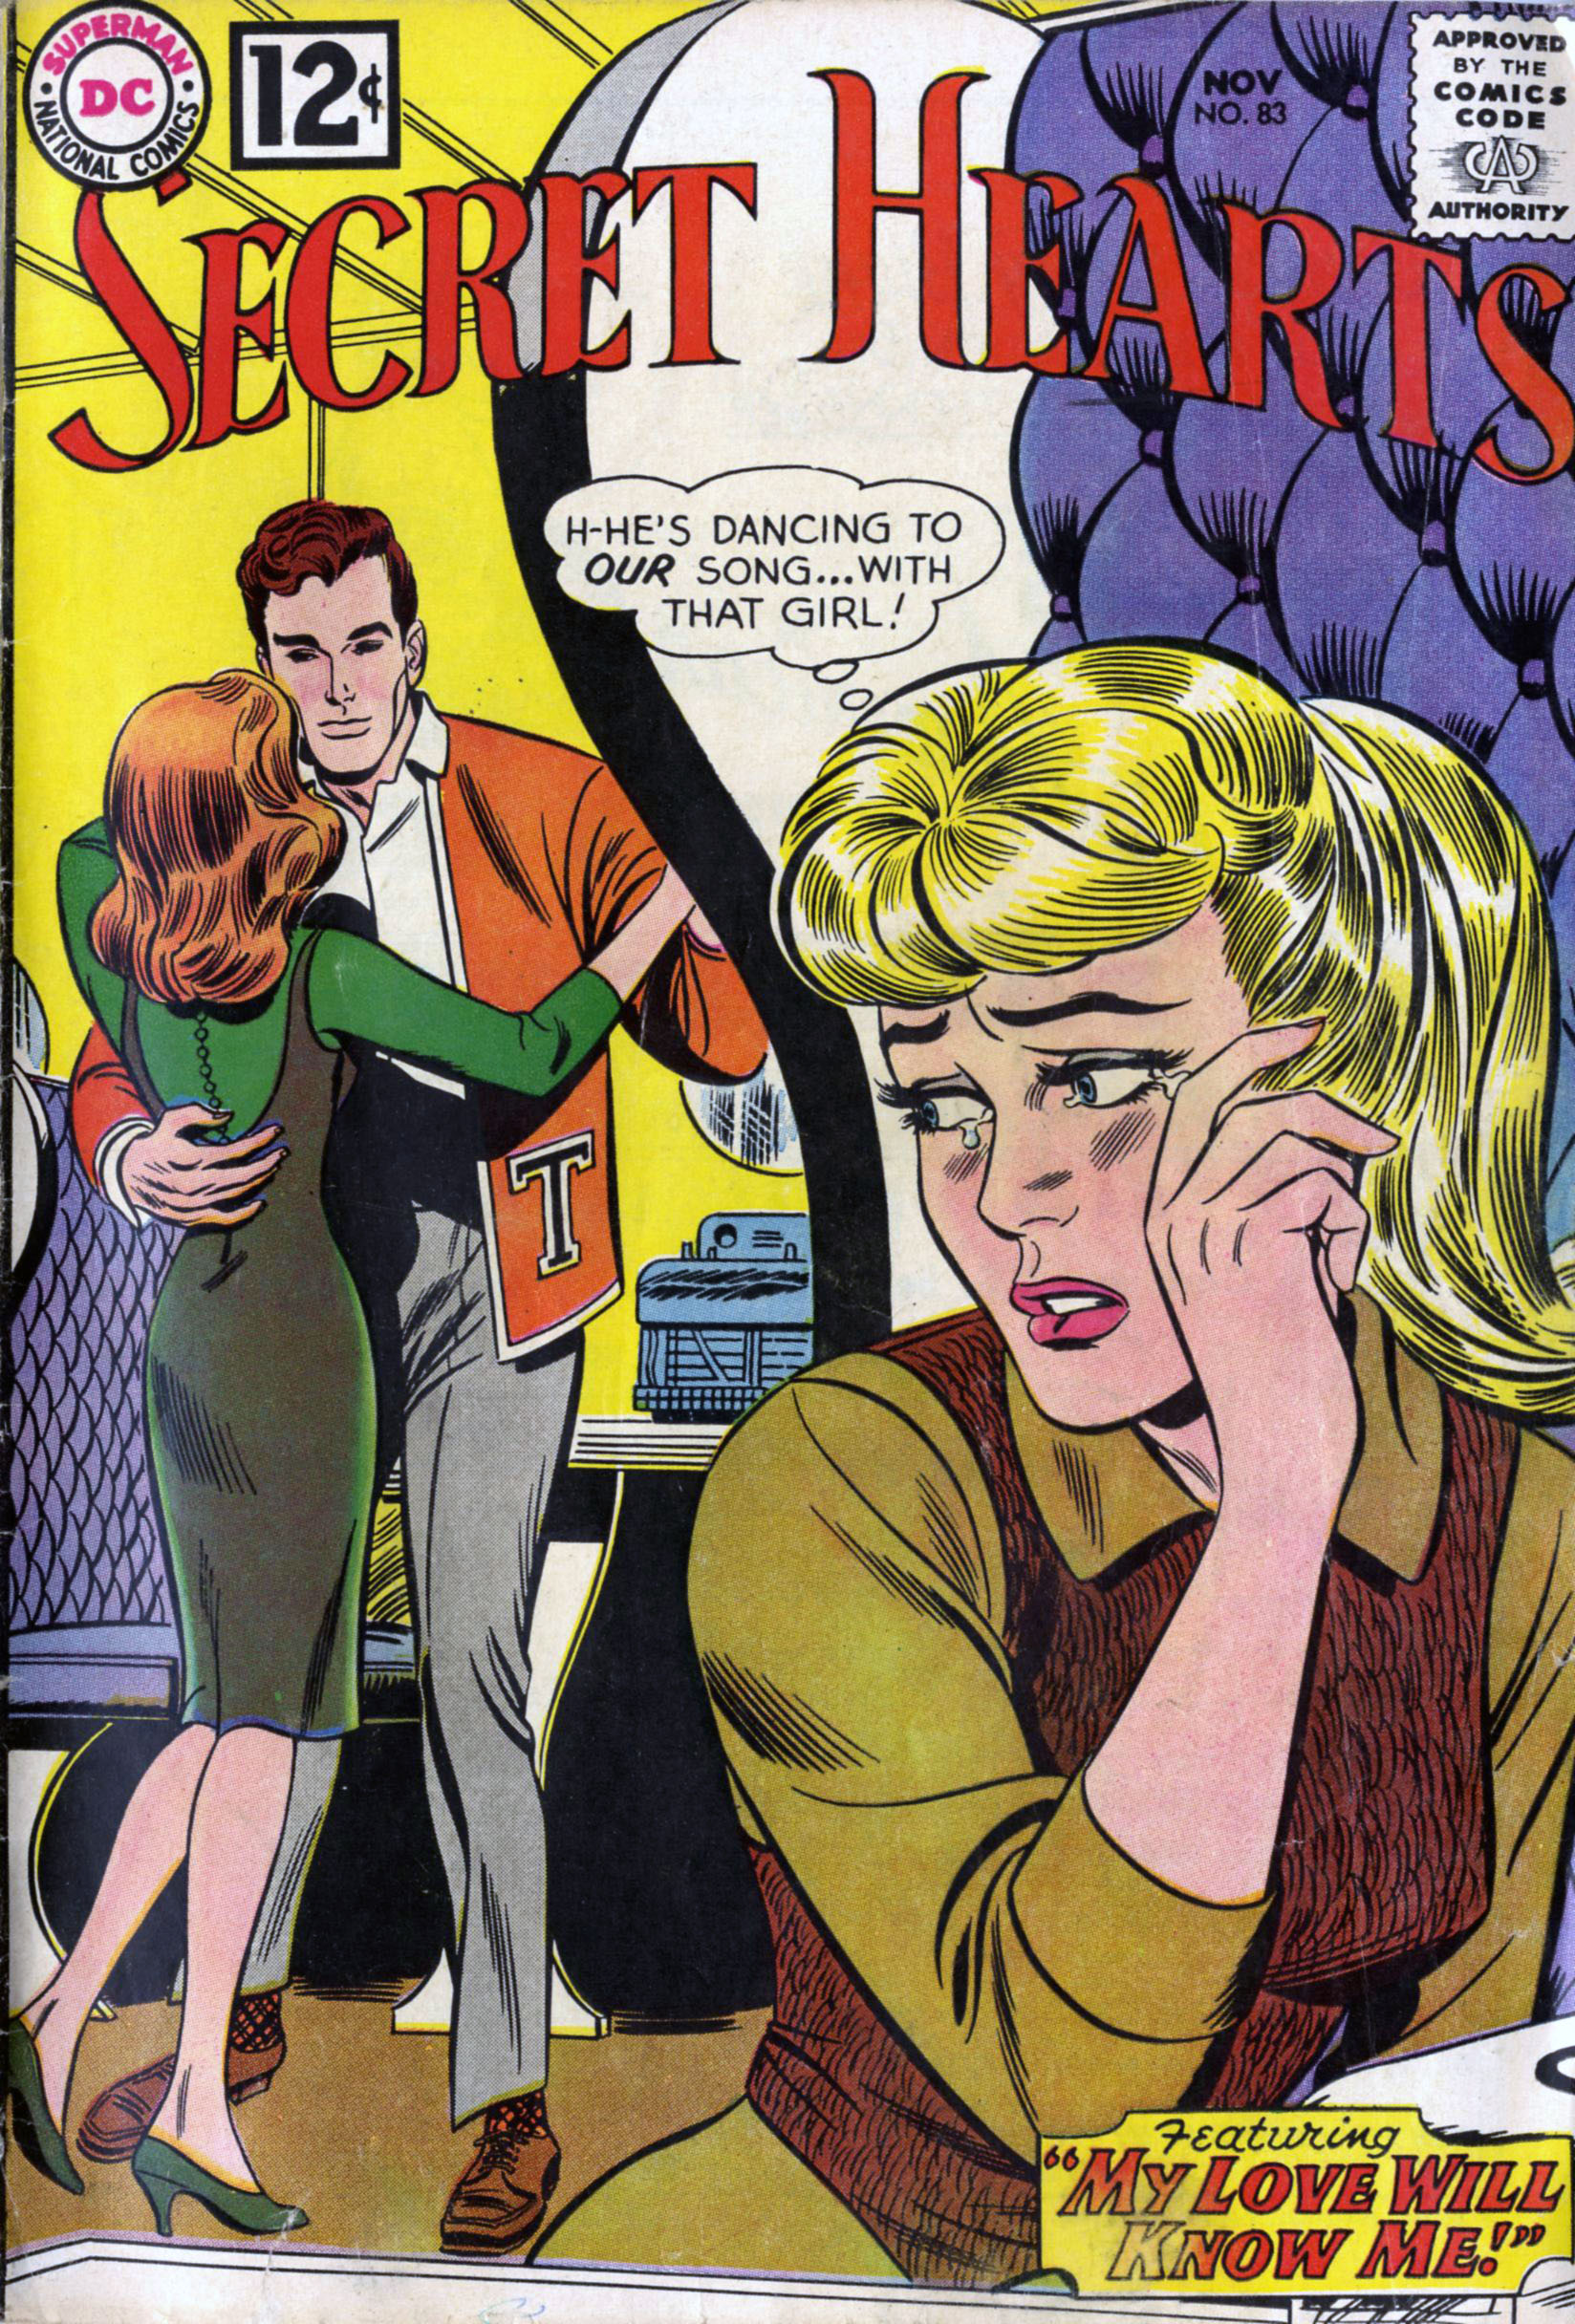 Read online Secret Hearts comic -  Issue #83 - 1